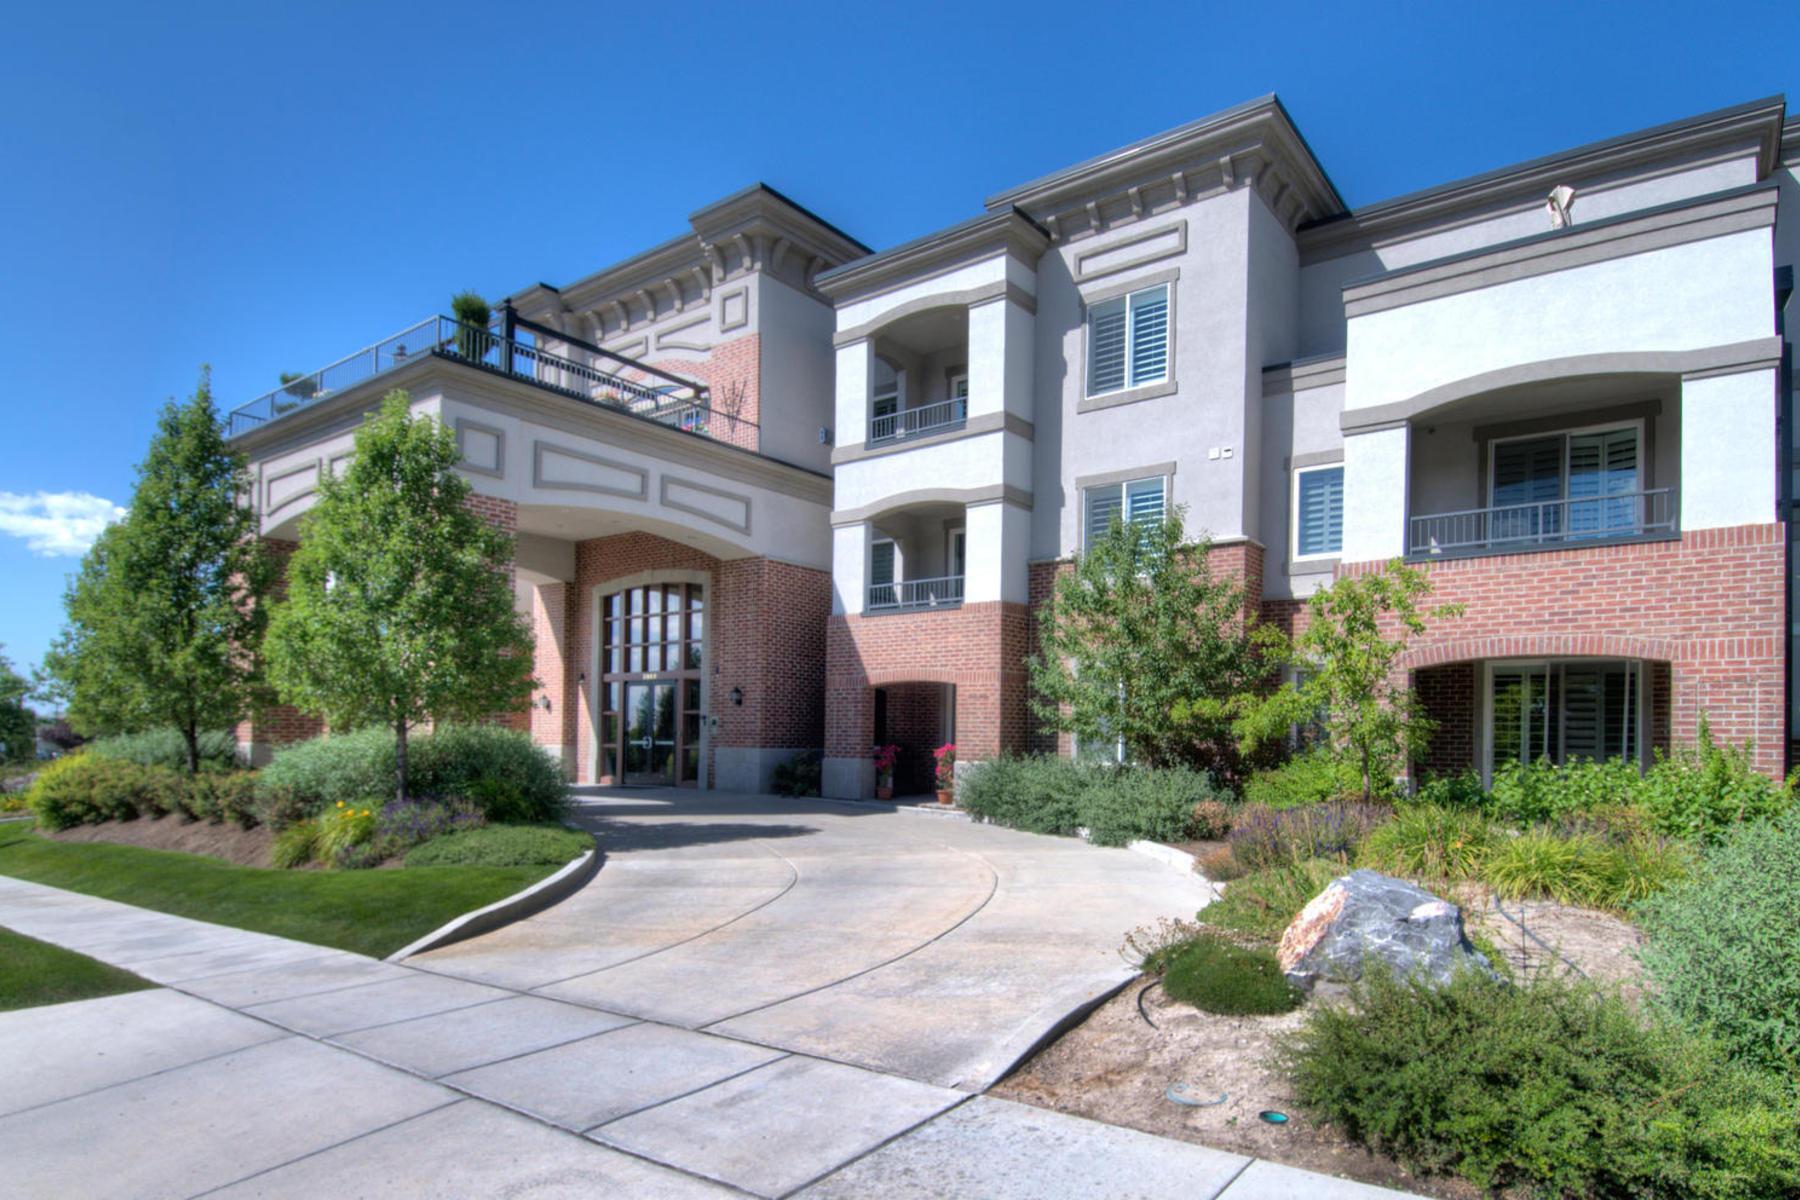 Condominium for Sale at Beautiful Country Club Ridge Condo 2665 Parleys Way Unit 116 Salt Lake City, Utah 84109 United States